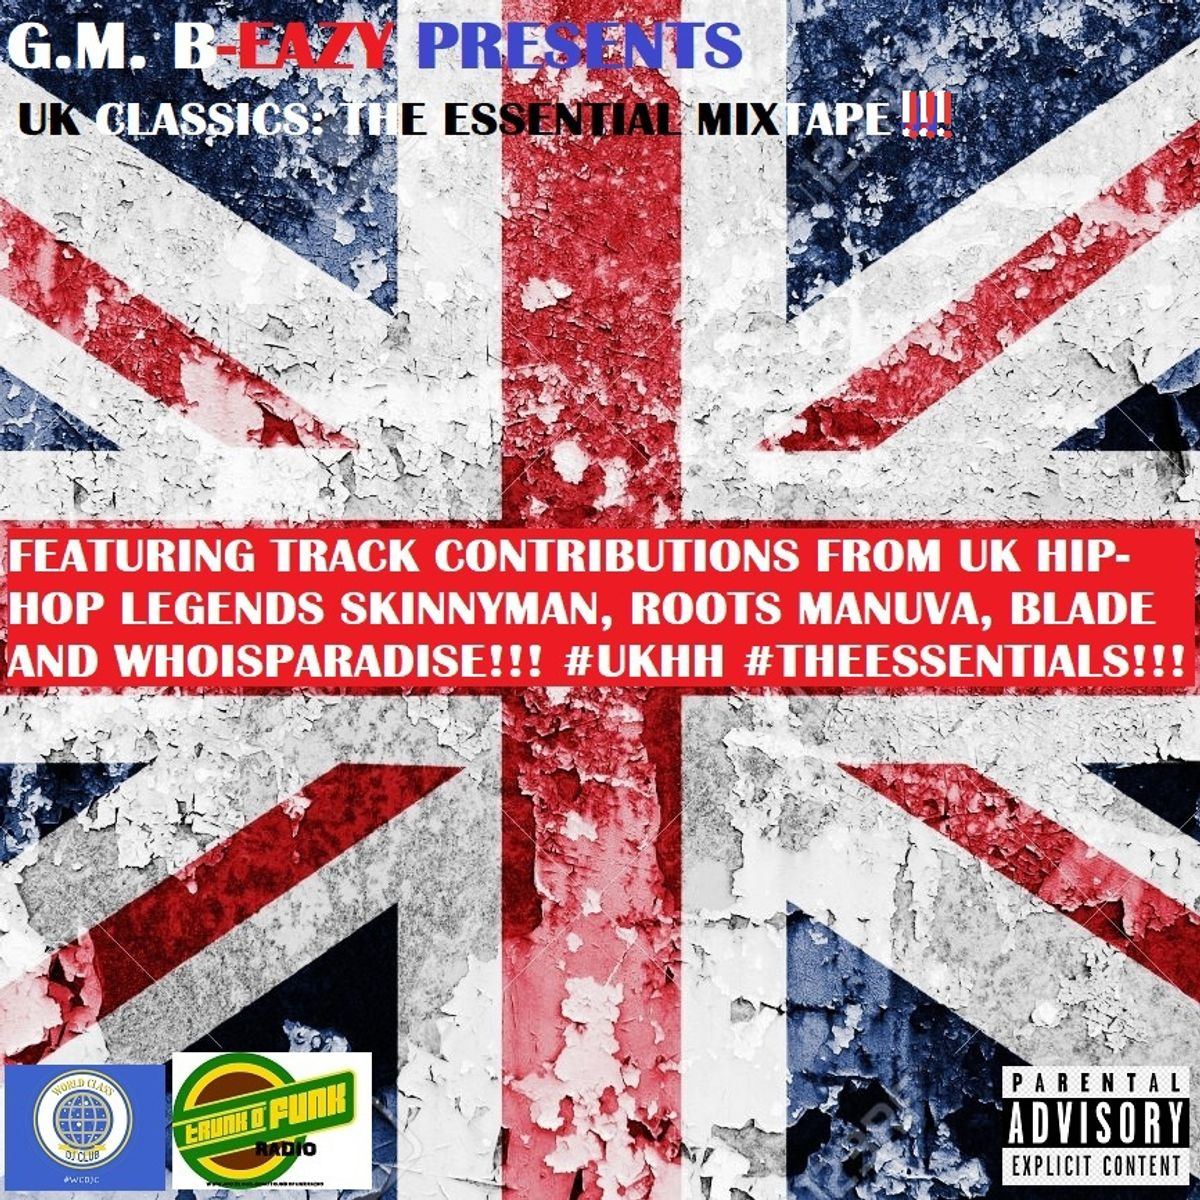 UK Classics Mixtape | UK HipHop aus den 90ern im feinem Mix